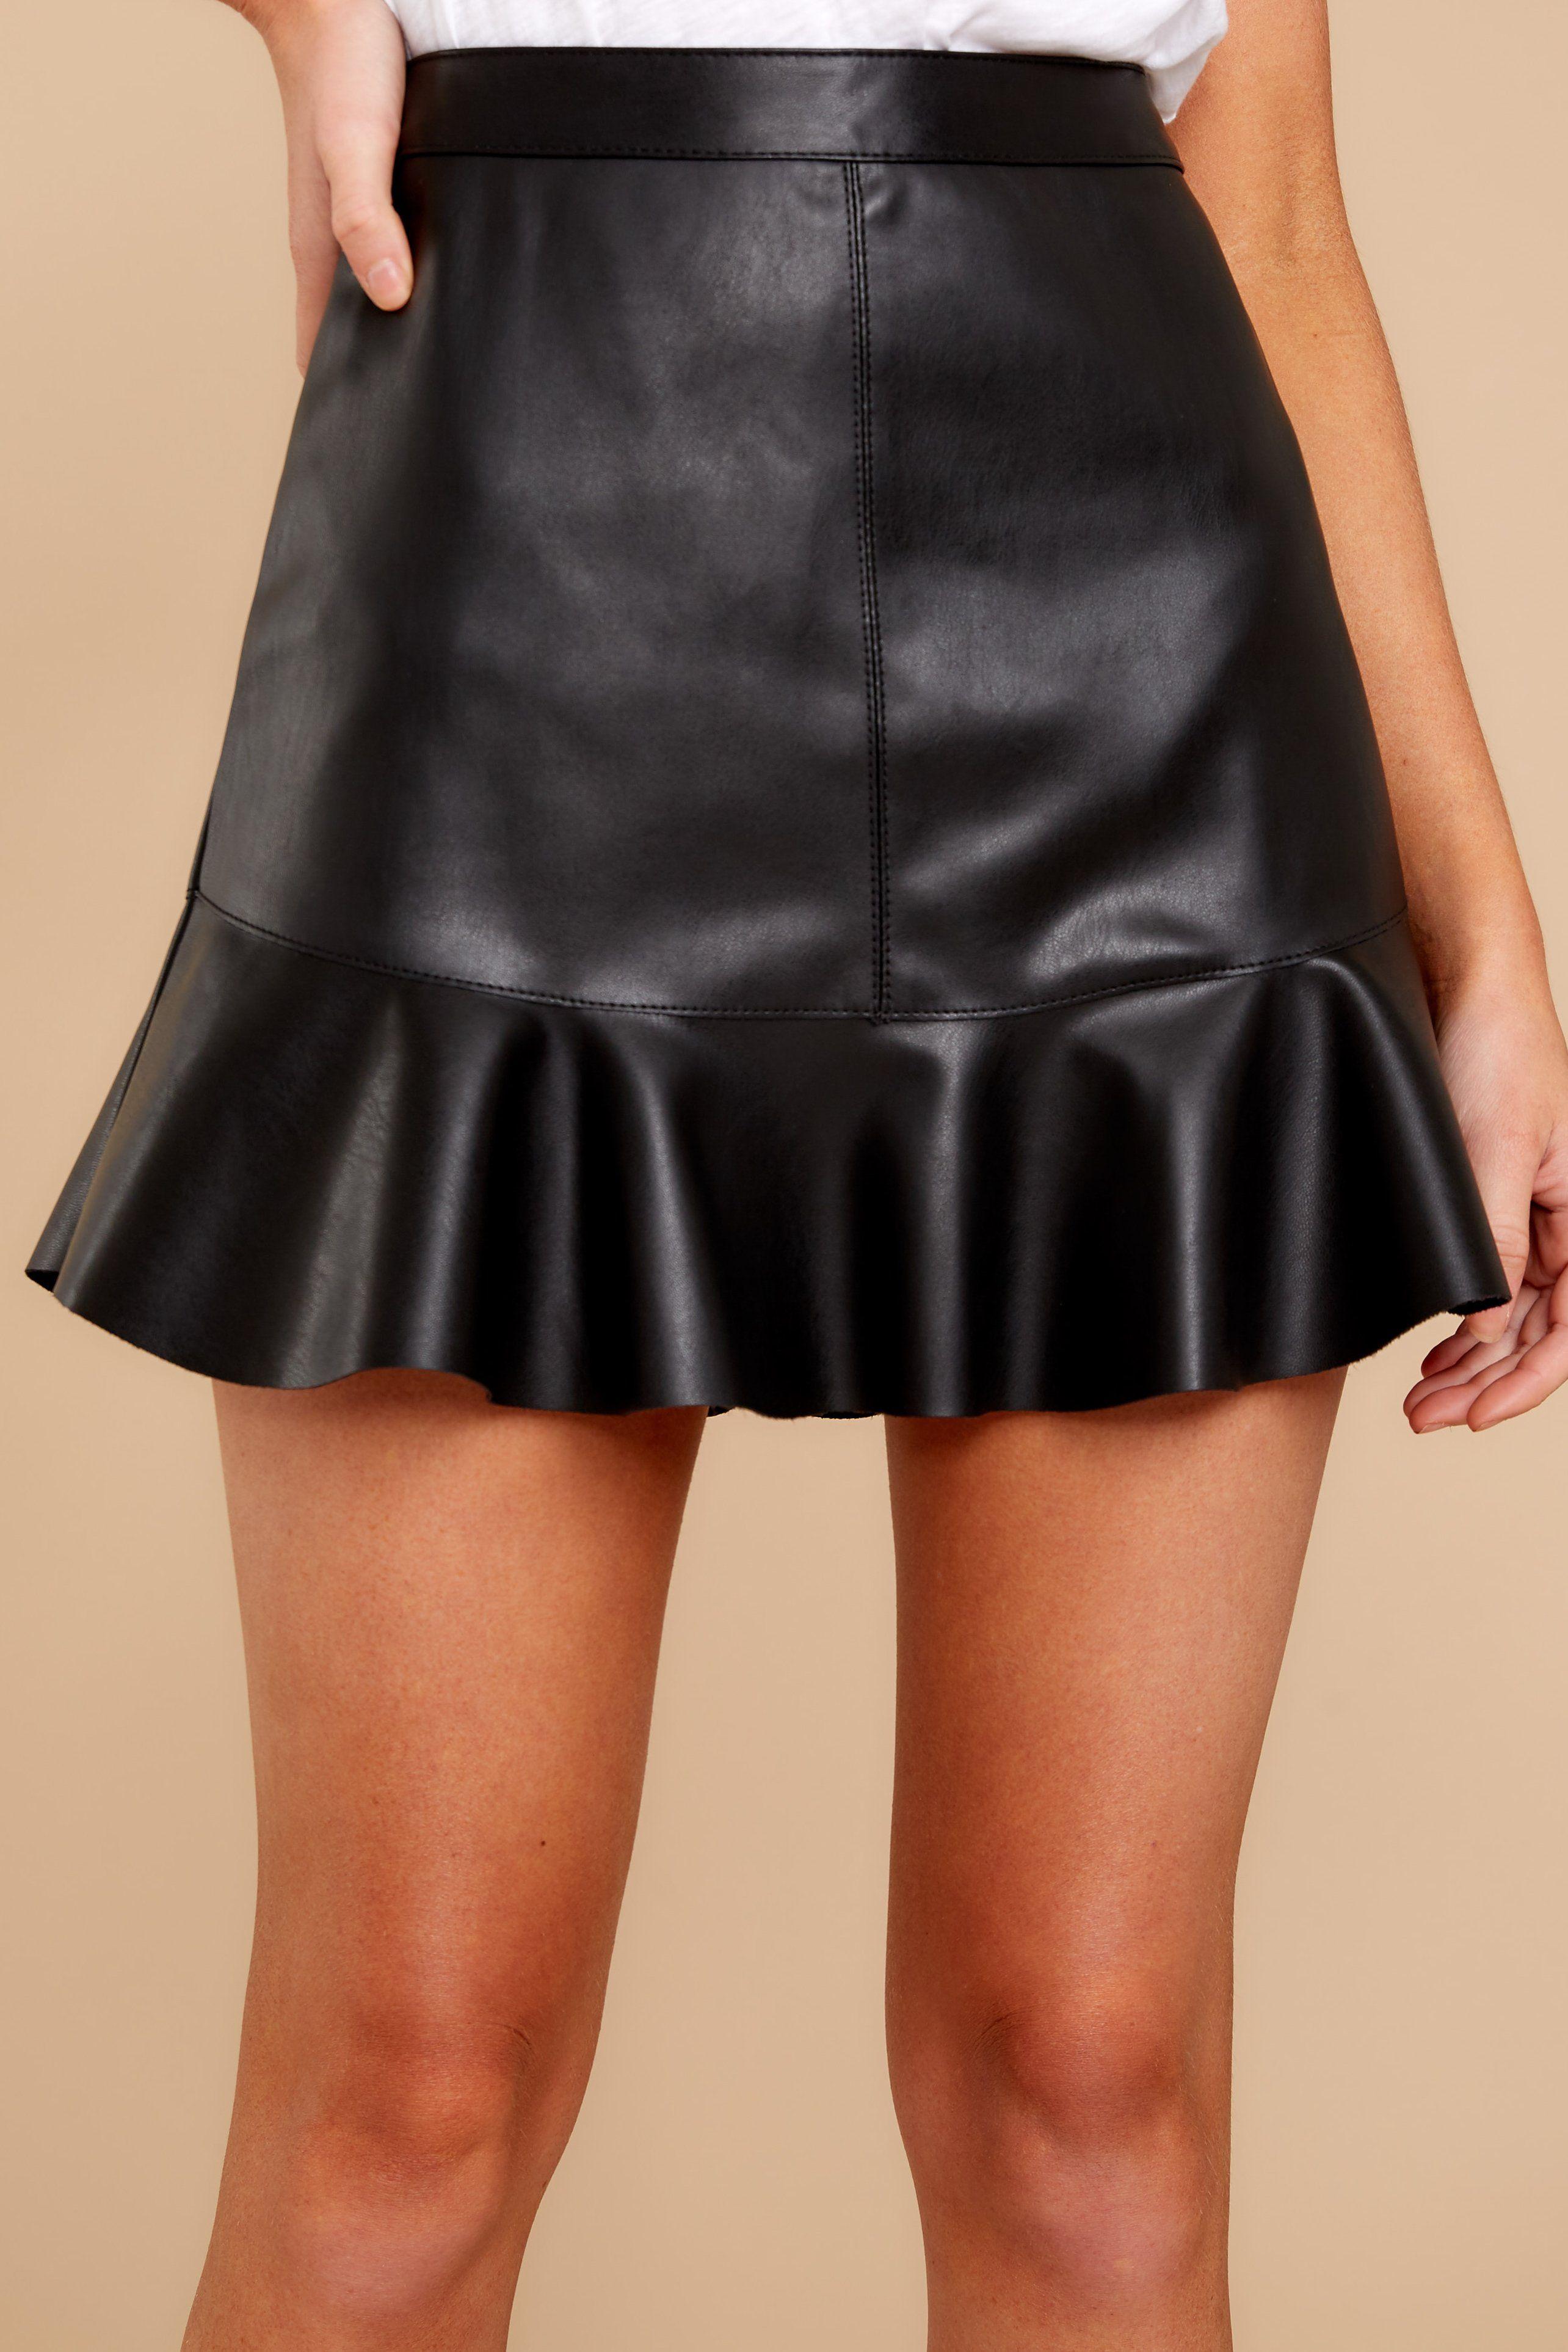 a1ec092b7c BB Dakota Black Mini Skirt - Faux Leather Ruffle Skirt - Skirt - $74 – Red  Dress Boutique